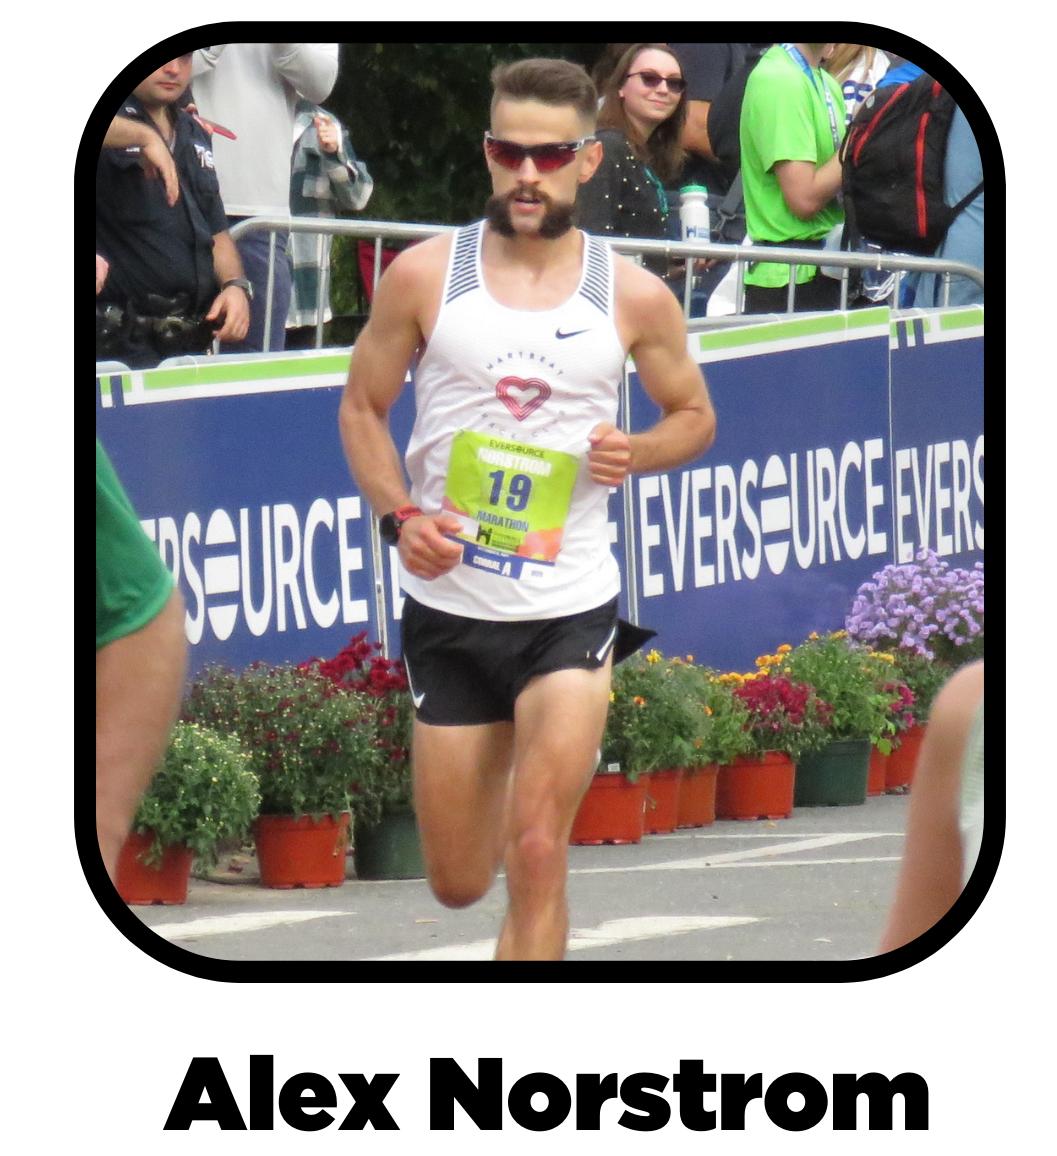 Alex Norstrom